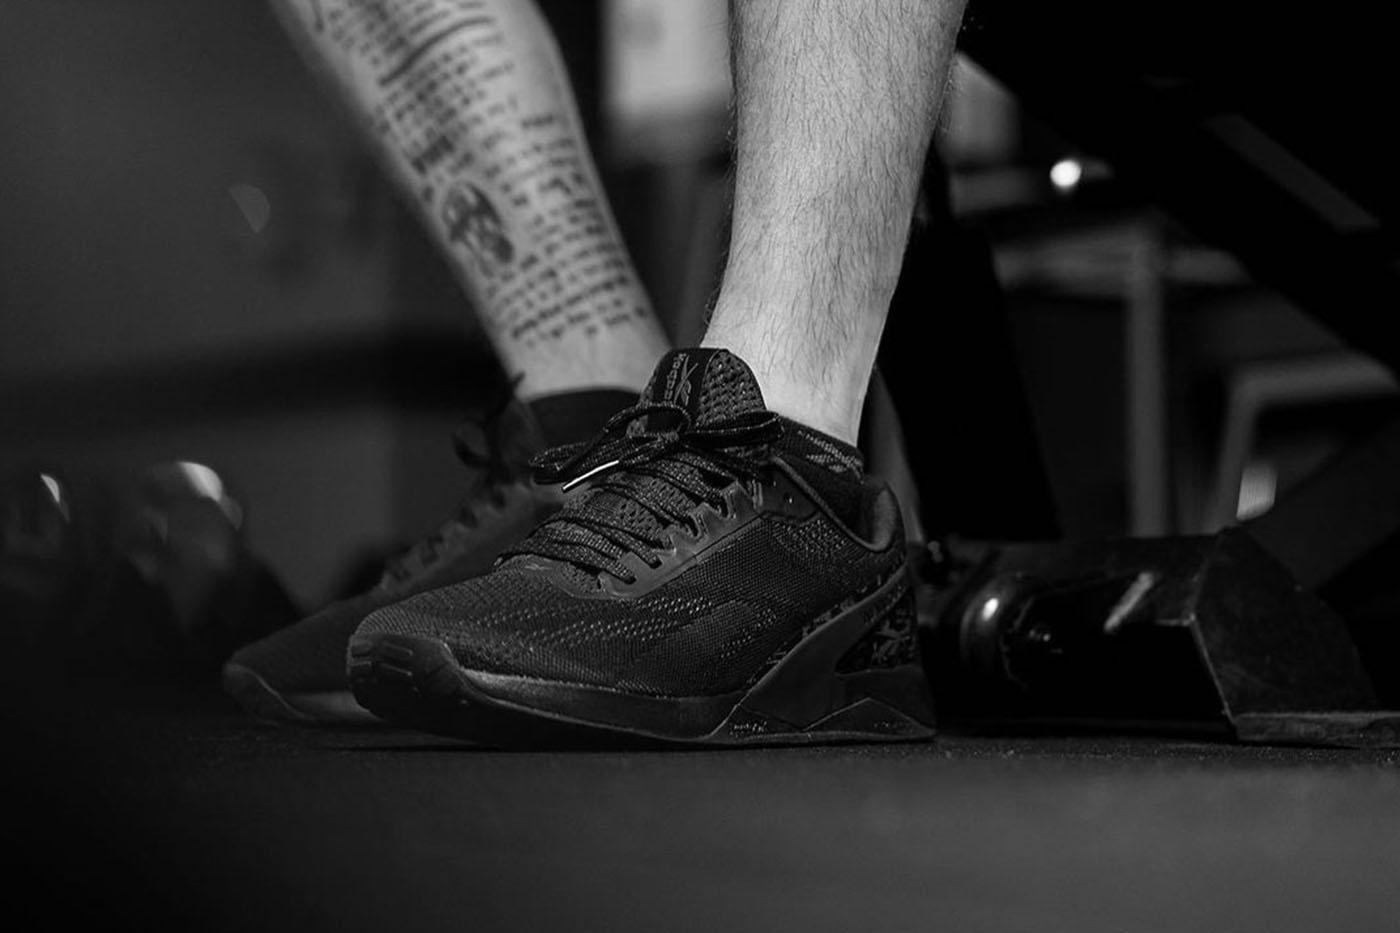 buty treningowe buty treningowe damskie buty treningowe męskie buty do treningu buty na crossfit buty treningowe meskie buty do treningu siłowego